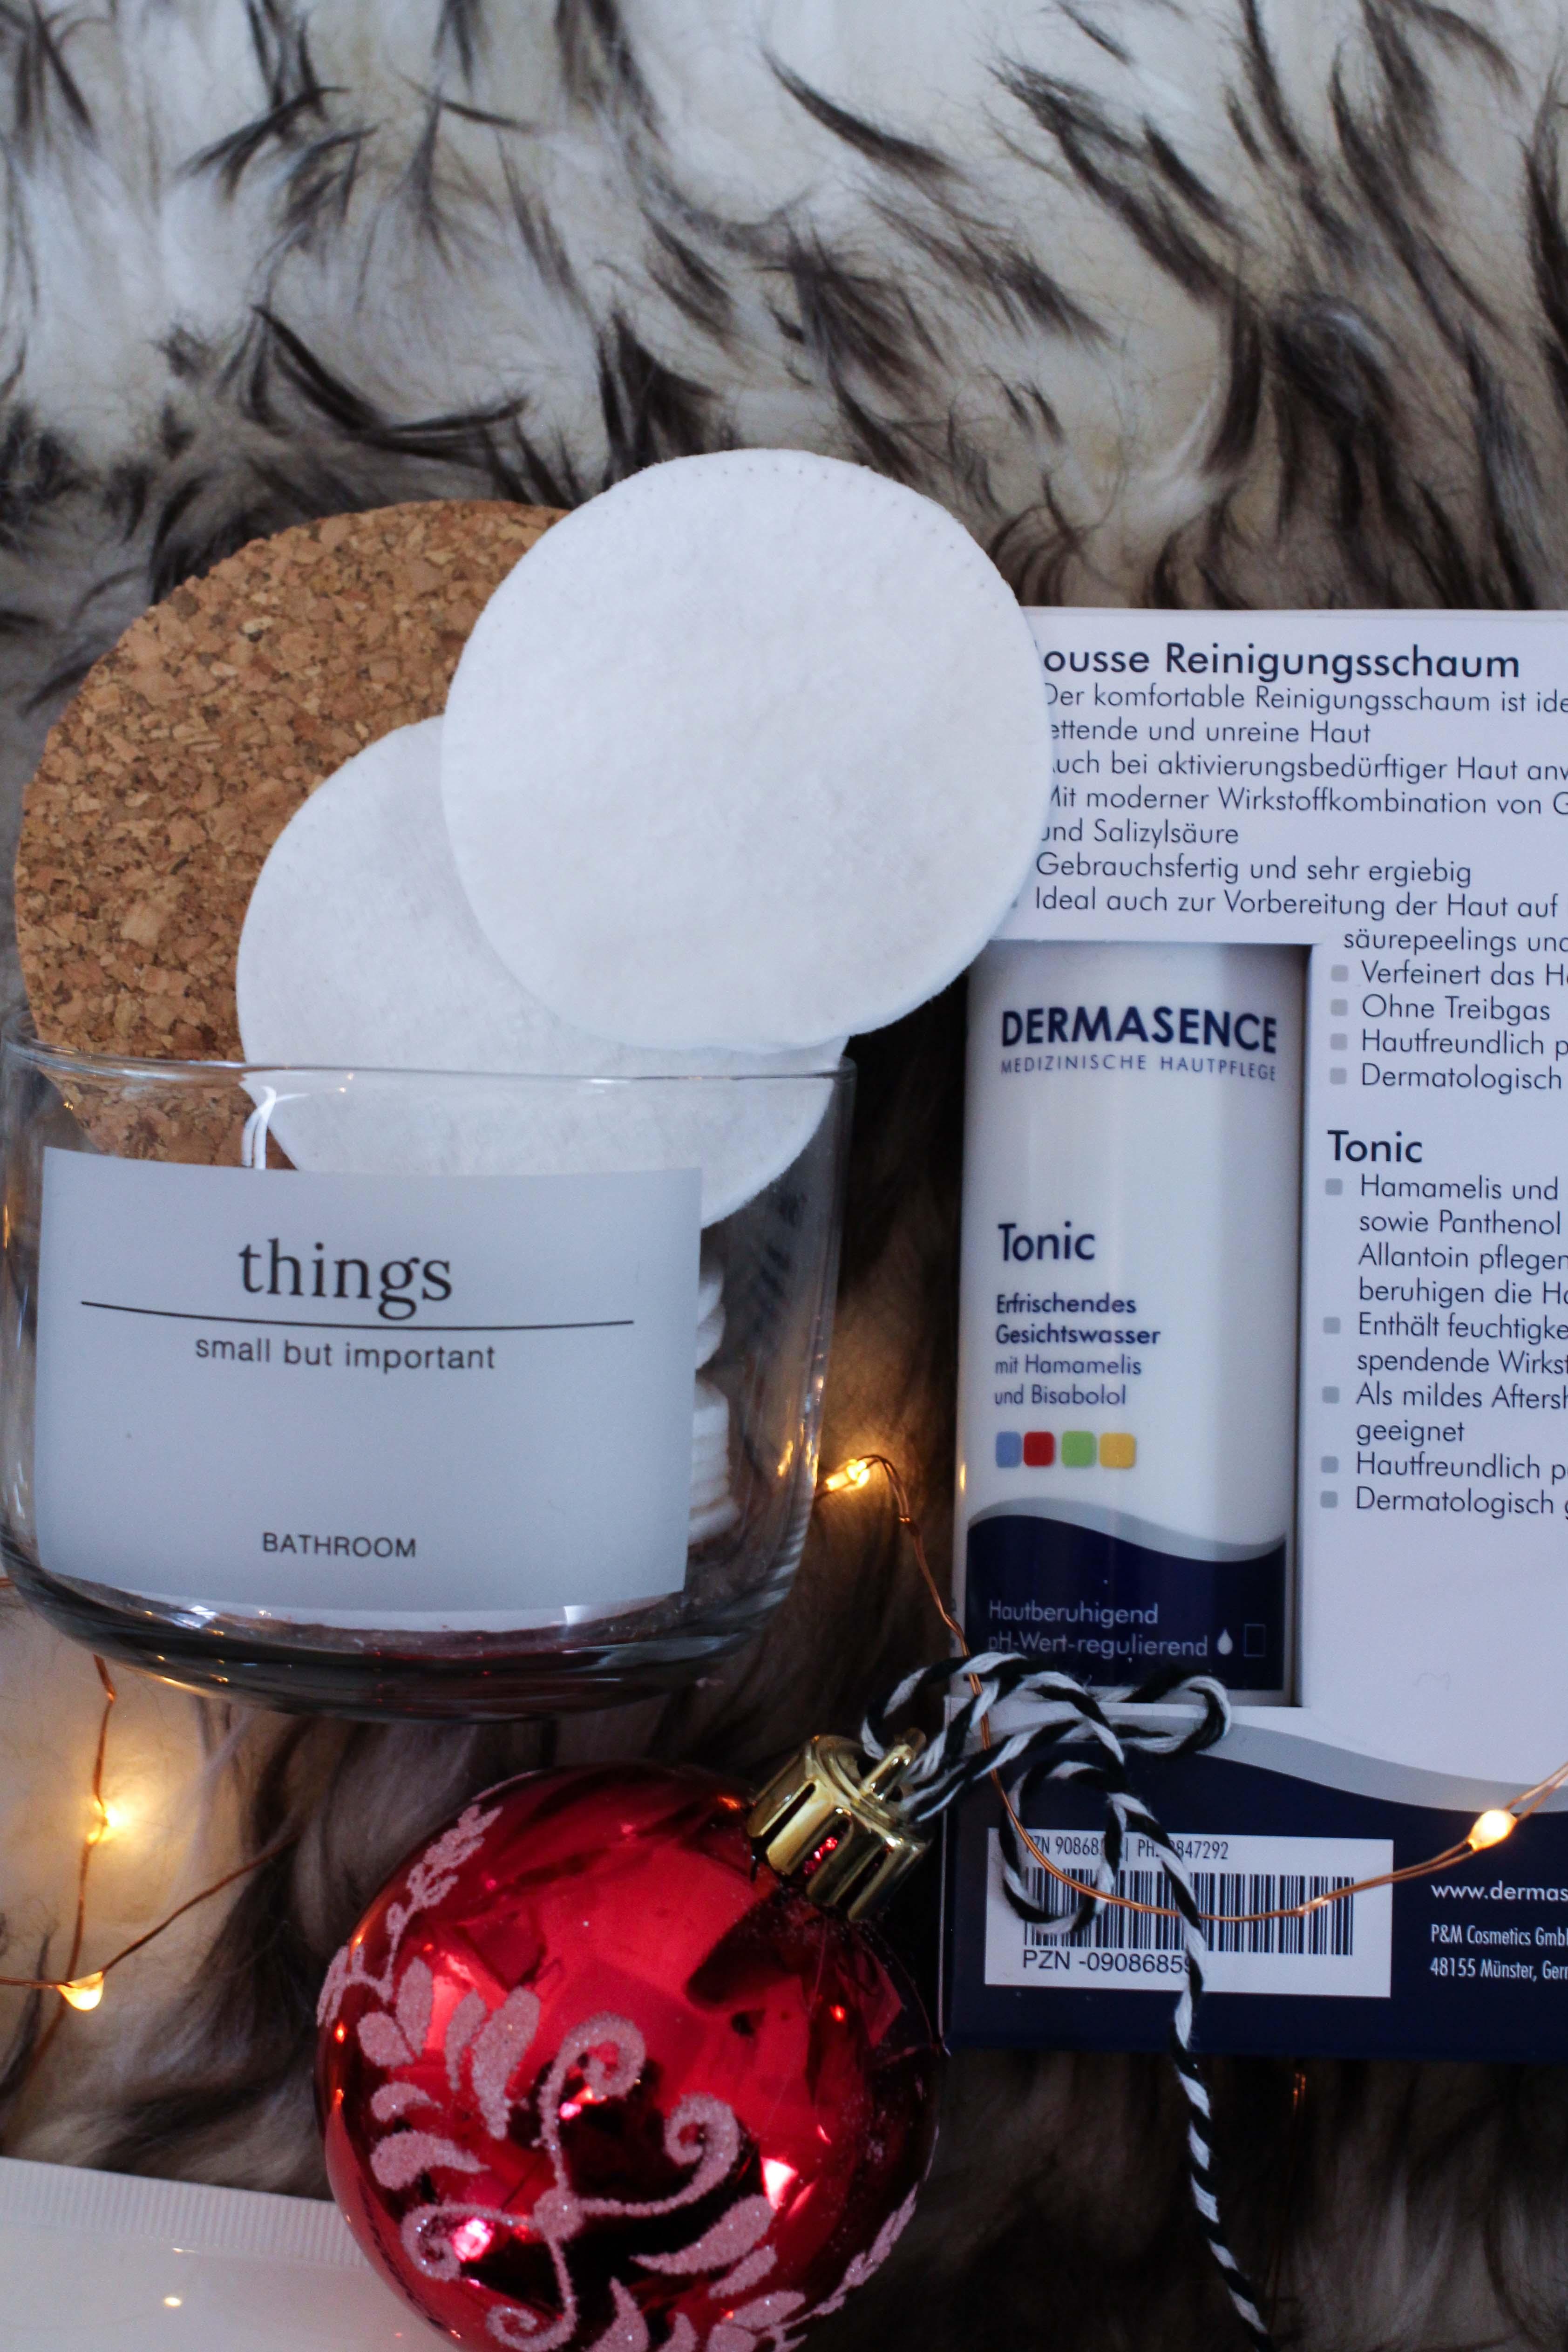 Blogger Adventskalender Gewinnspiel Dermasence Hautpflege Winter Urlaubs-Reiseset Tonic Mousse Reisegröße Beauty Blogger Tipps 2